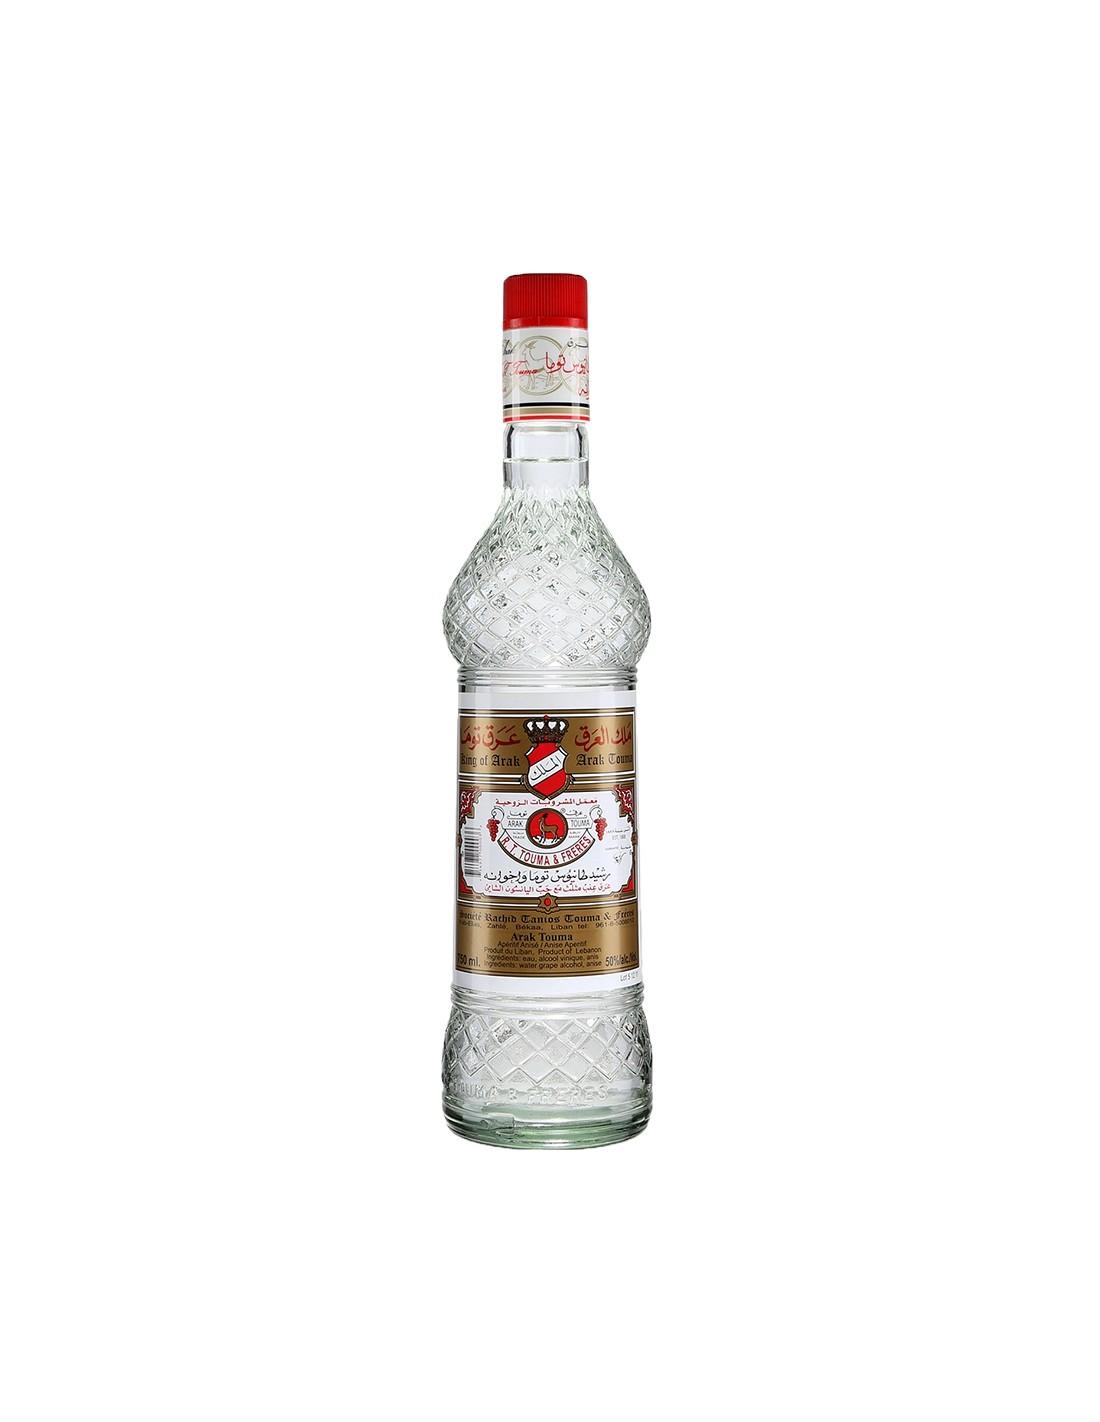 Bautura traditionala Arak Touma Extraliban, 50% alc., 0.7L